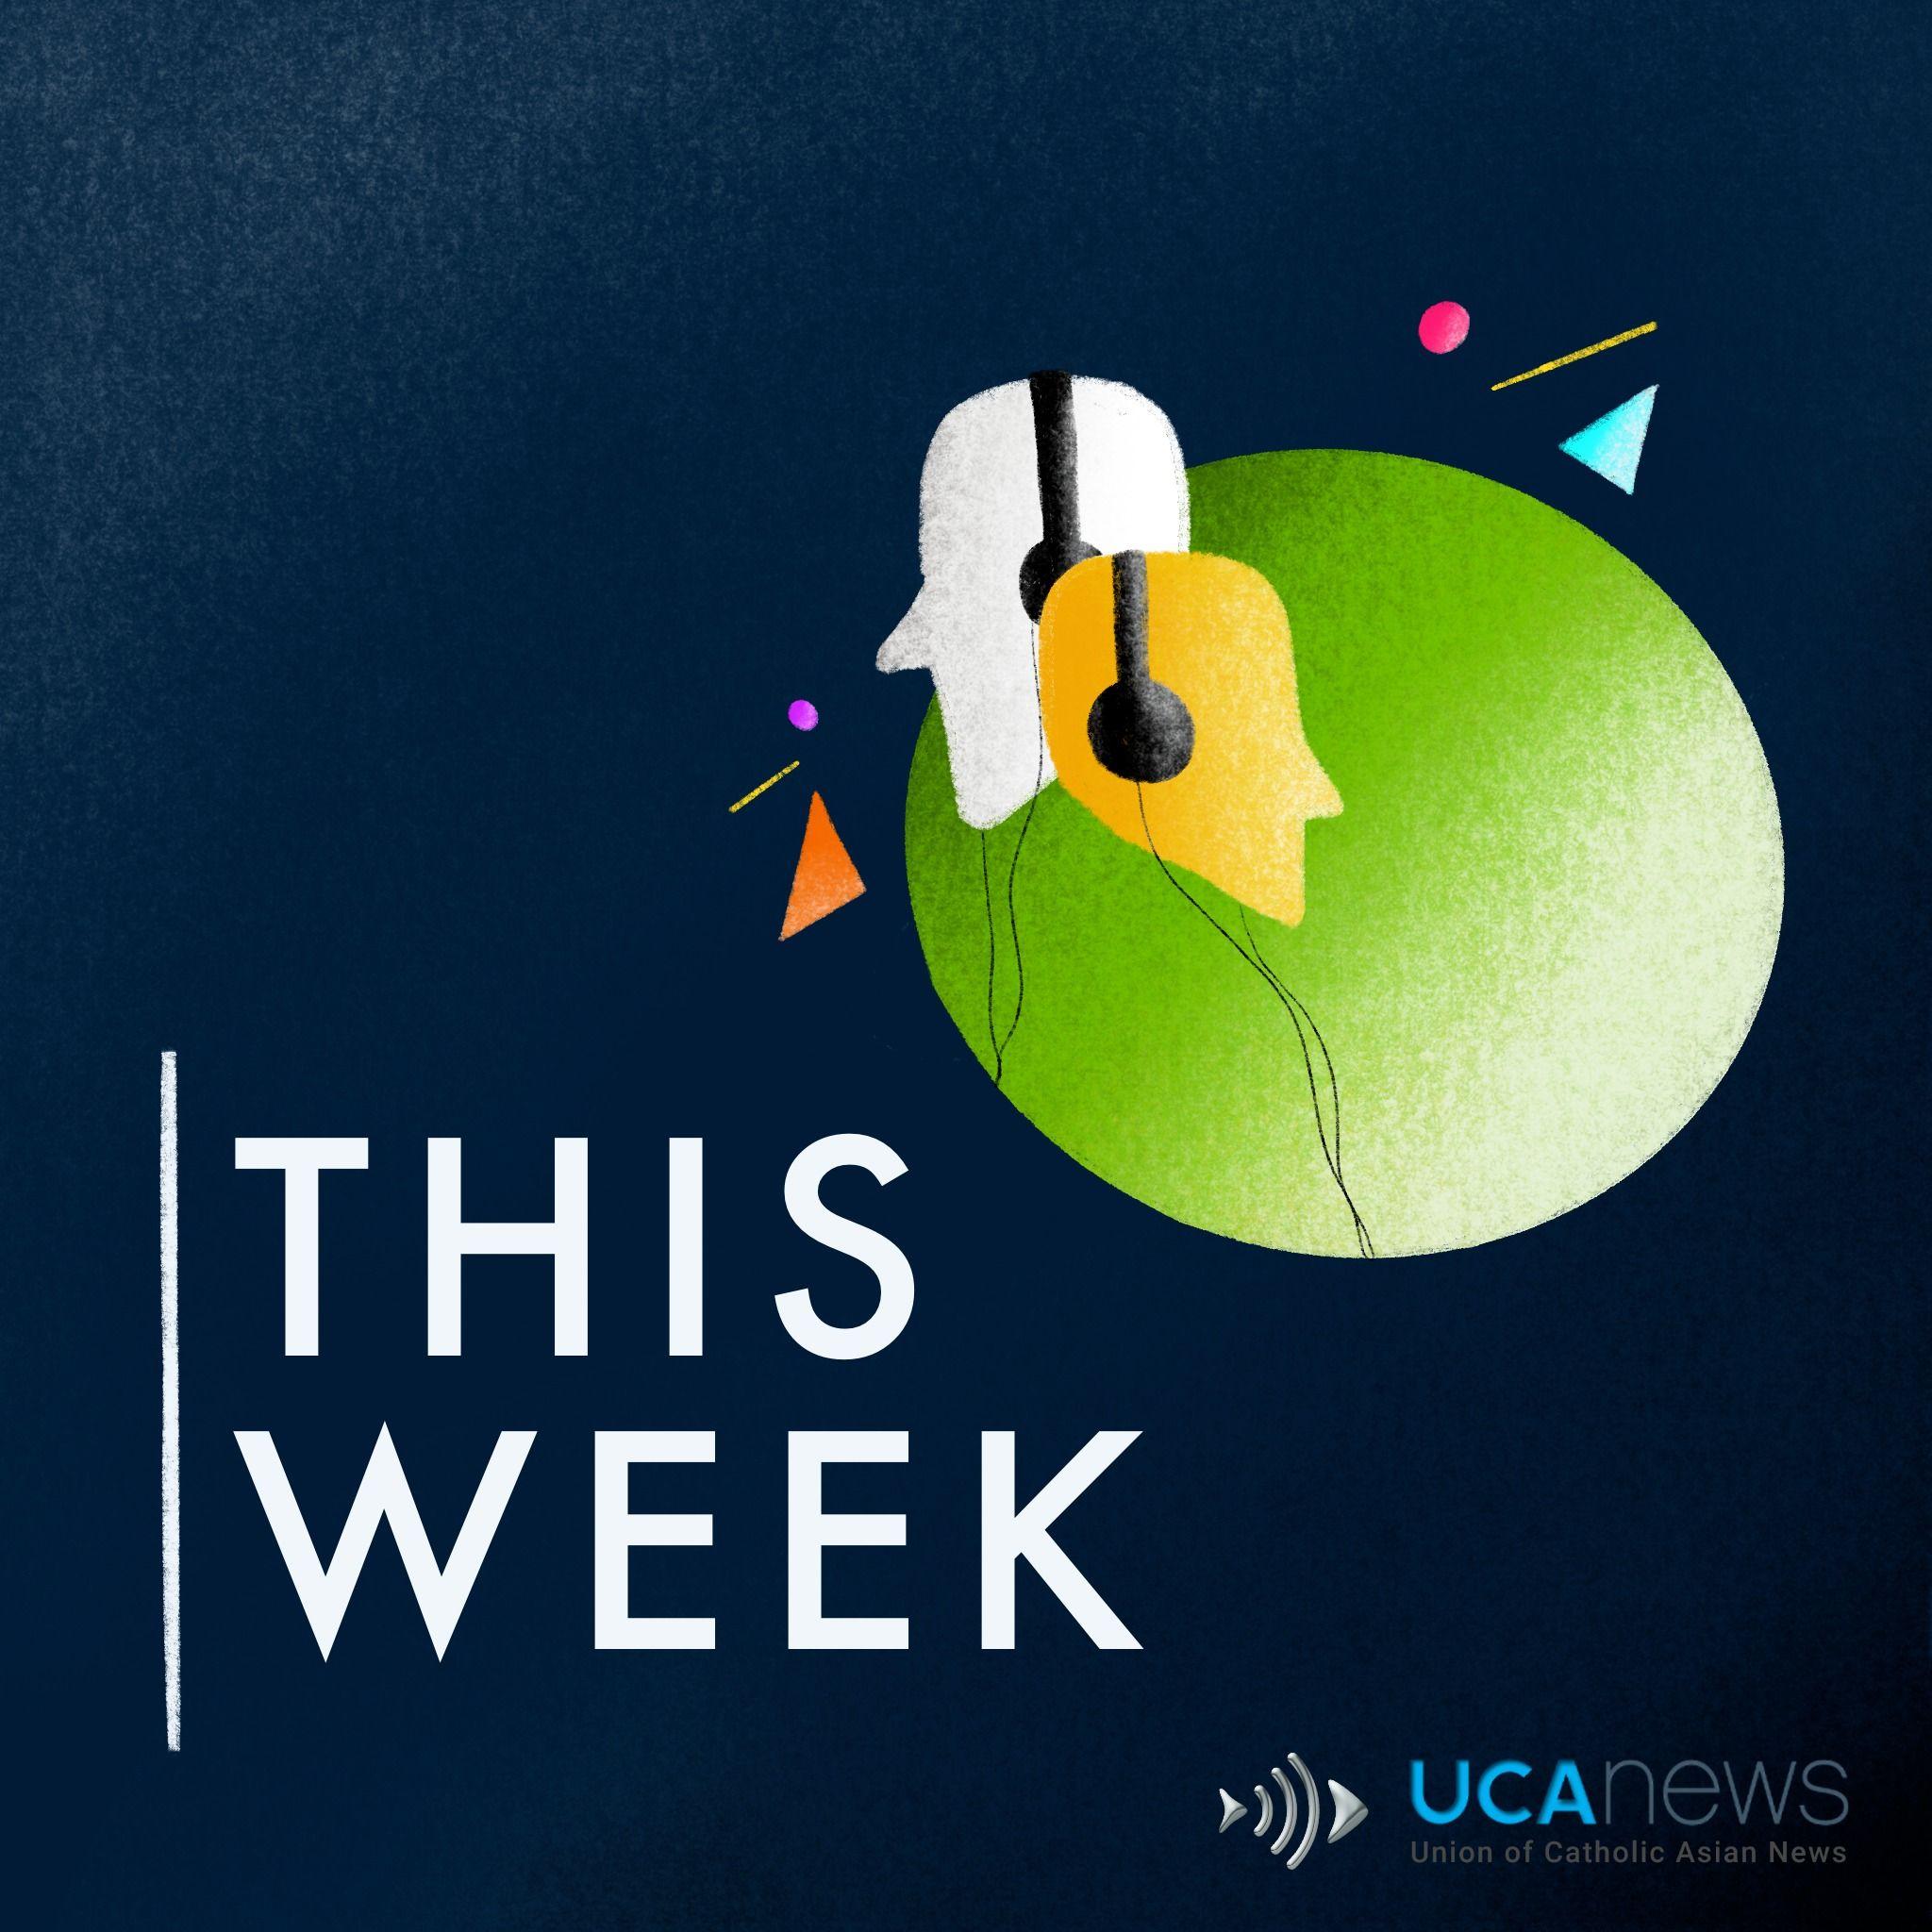 UCA News Weekly Summary, September 17, 2021